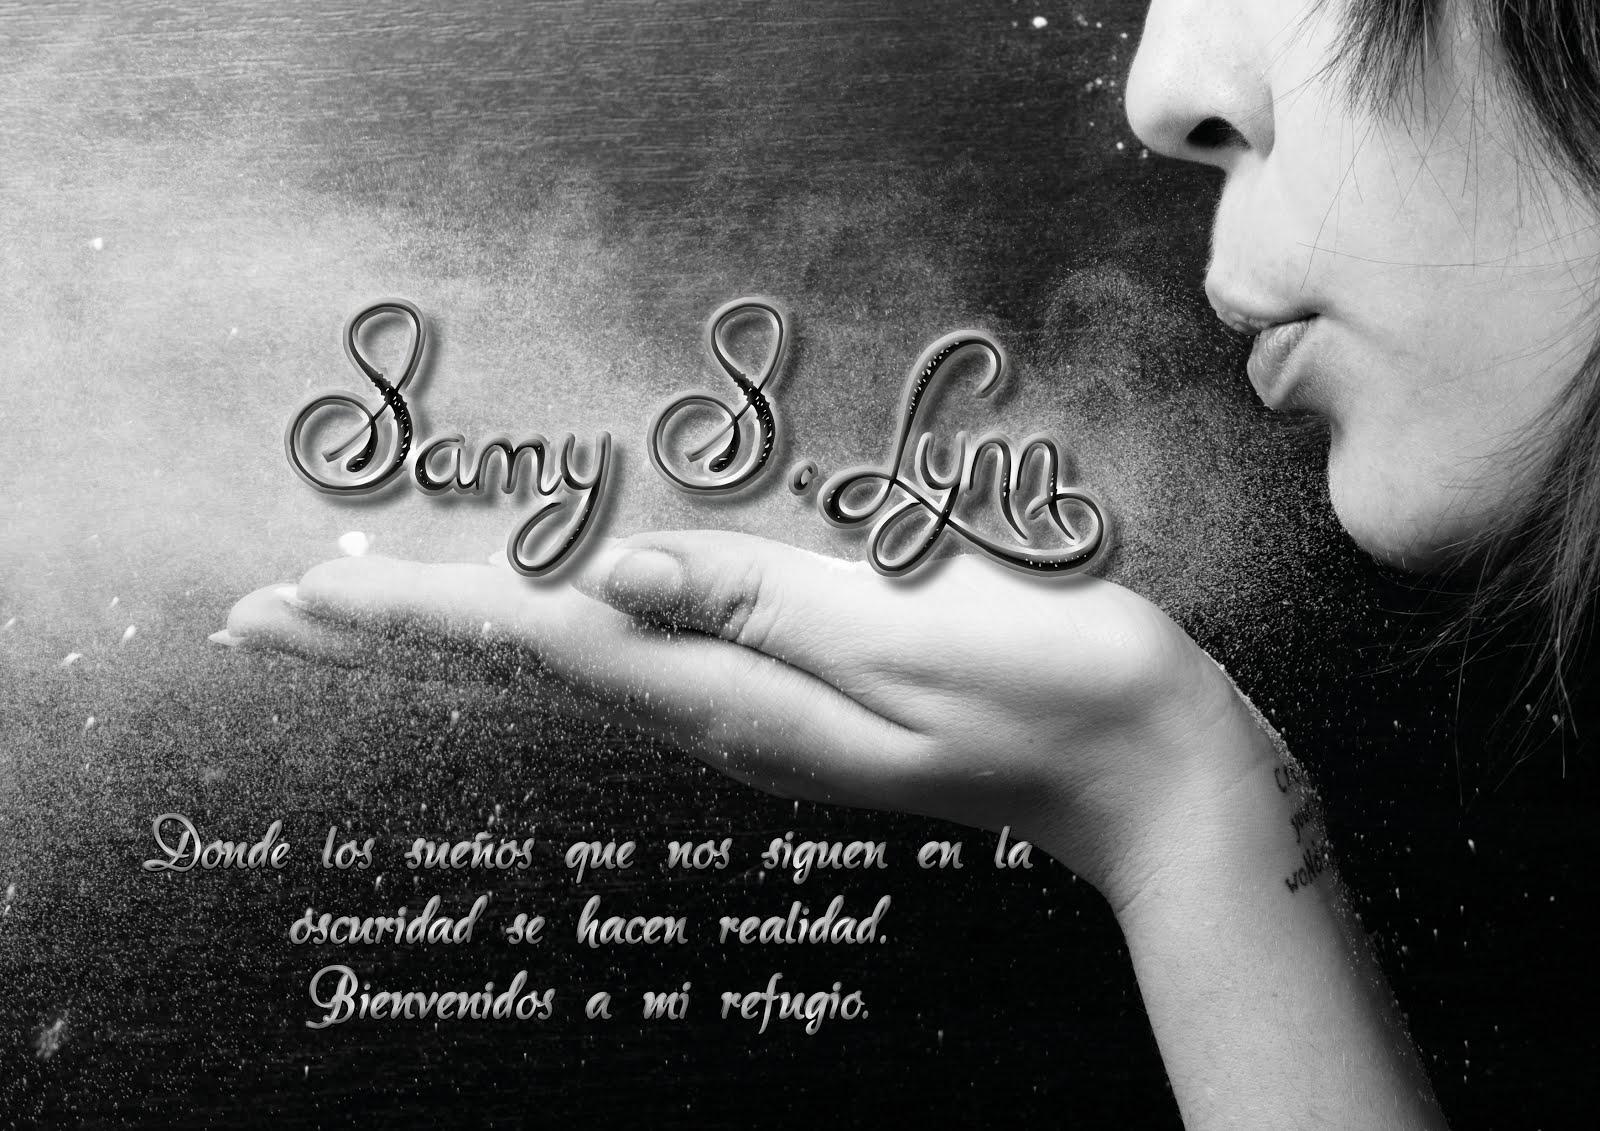 Samy S. Lynn